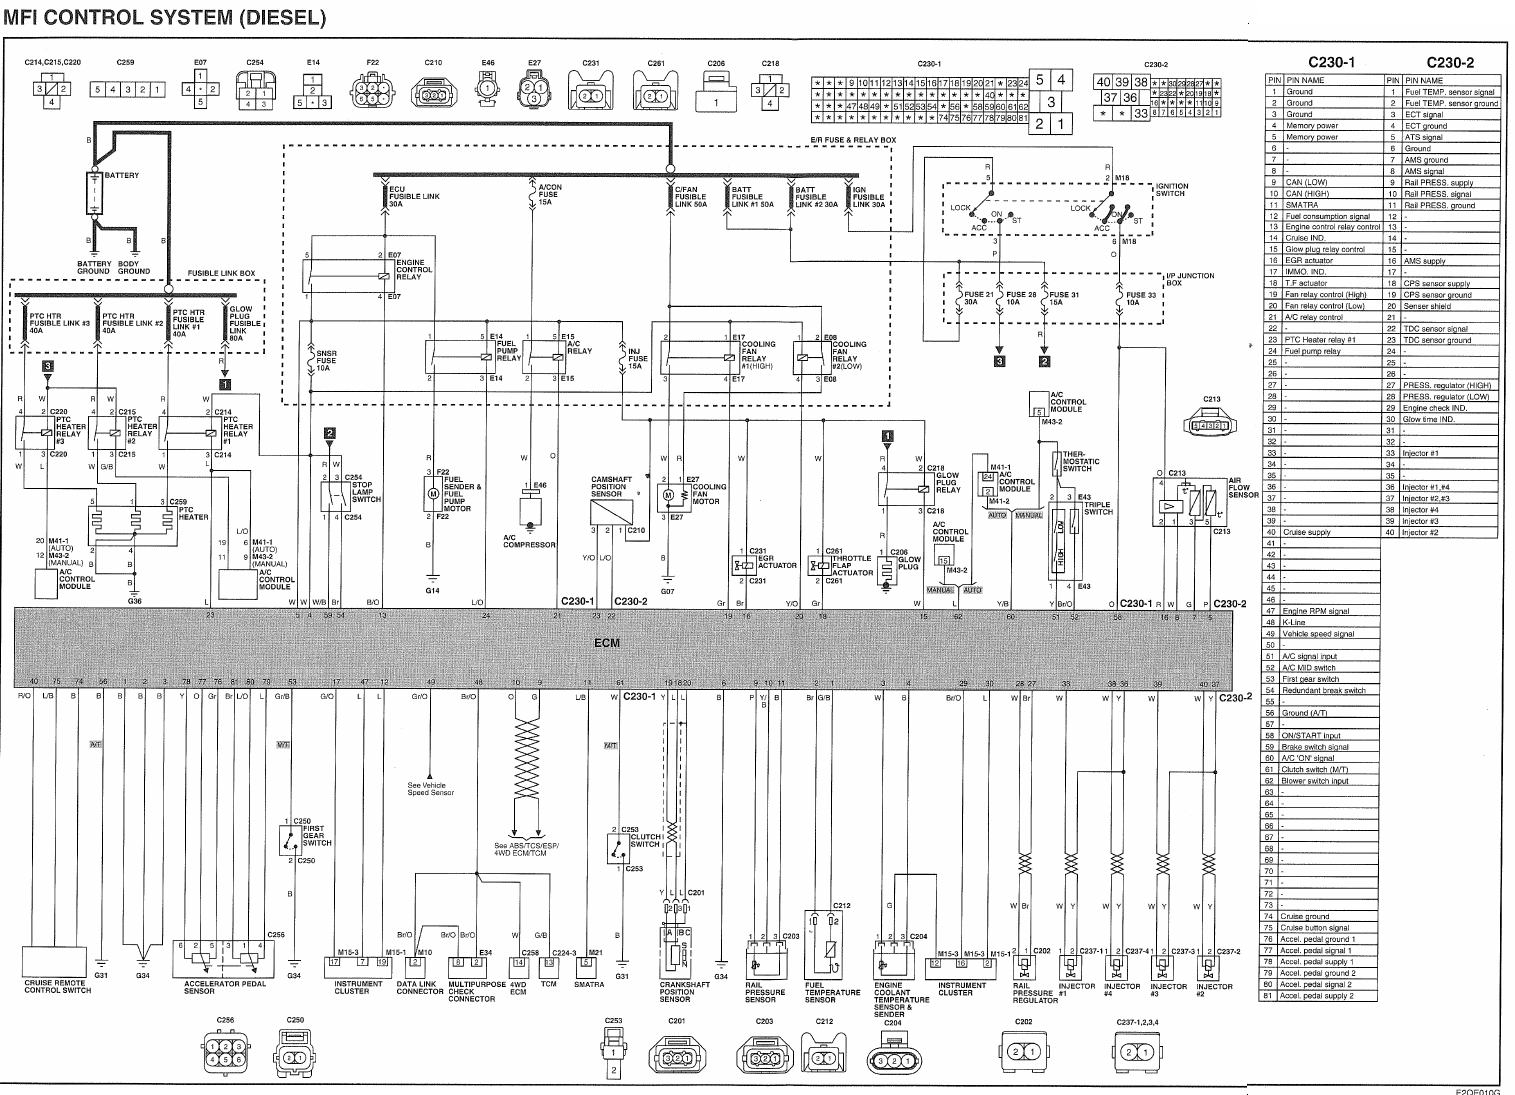 Hyundai Santum Fe 2001 Engine Diagram Air